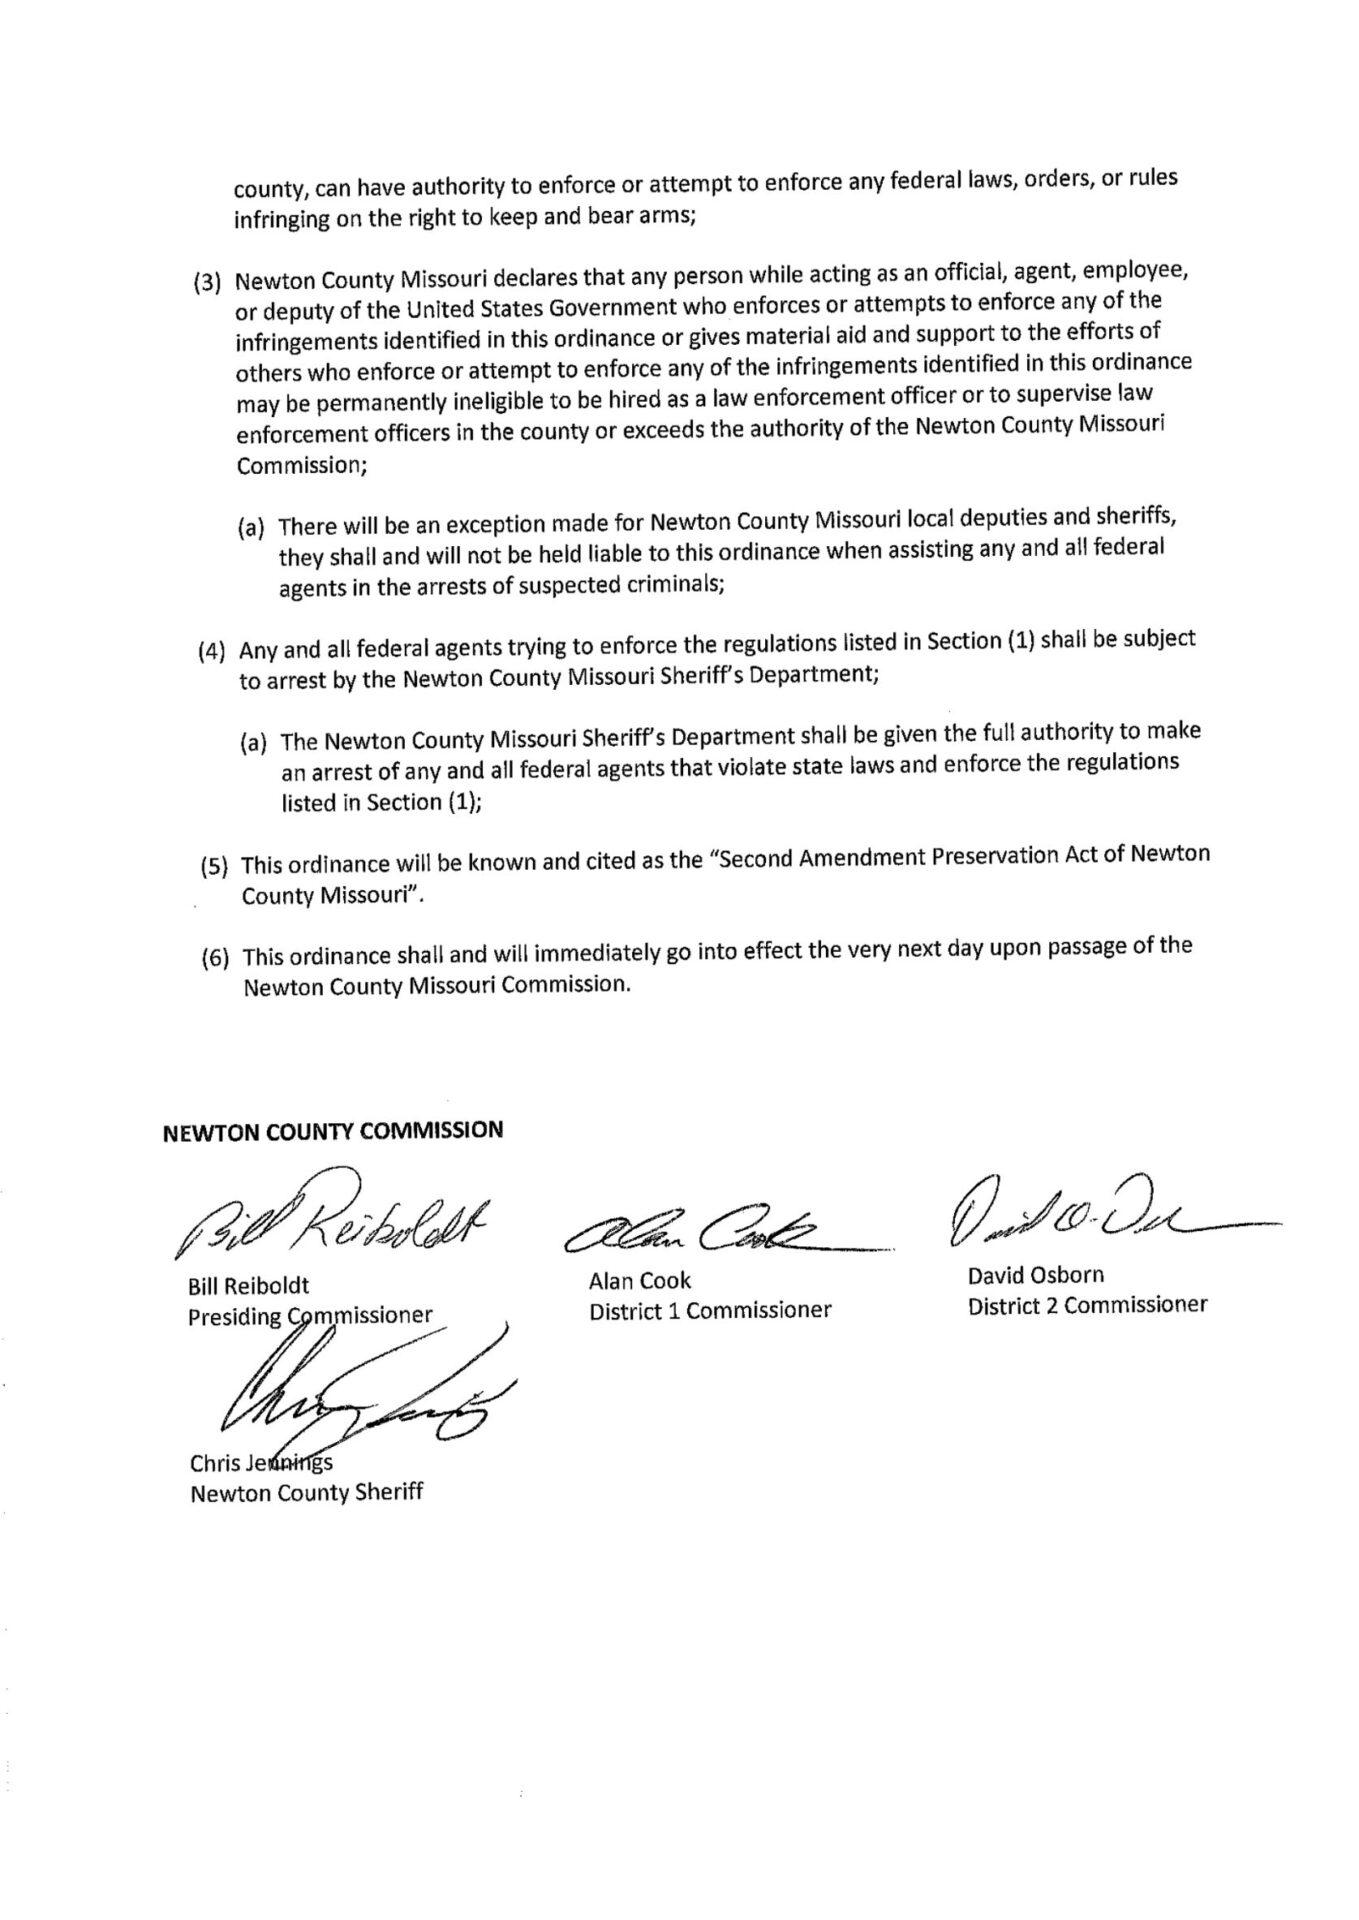 Newton County Second Amendment Preservation Act pg-2